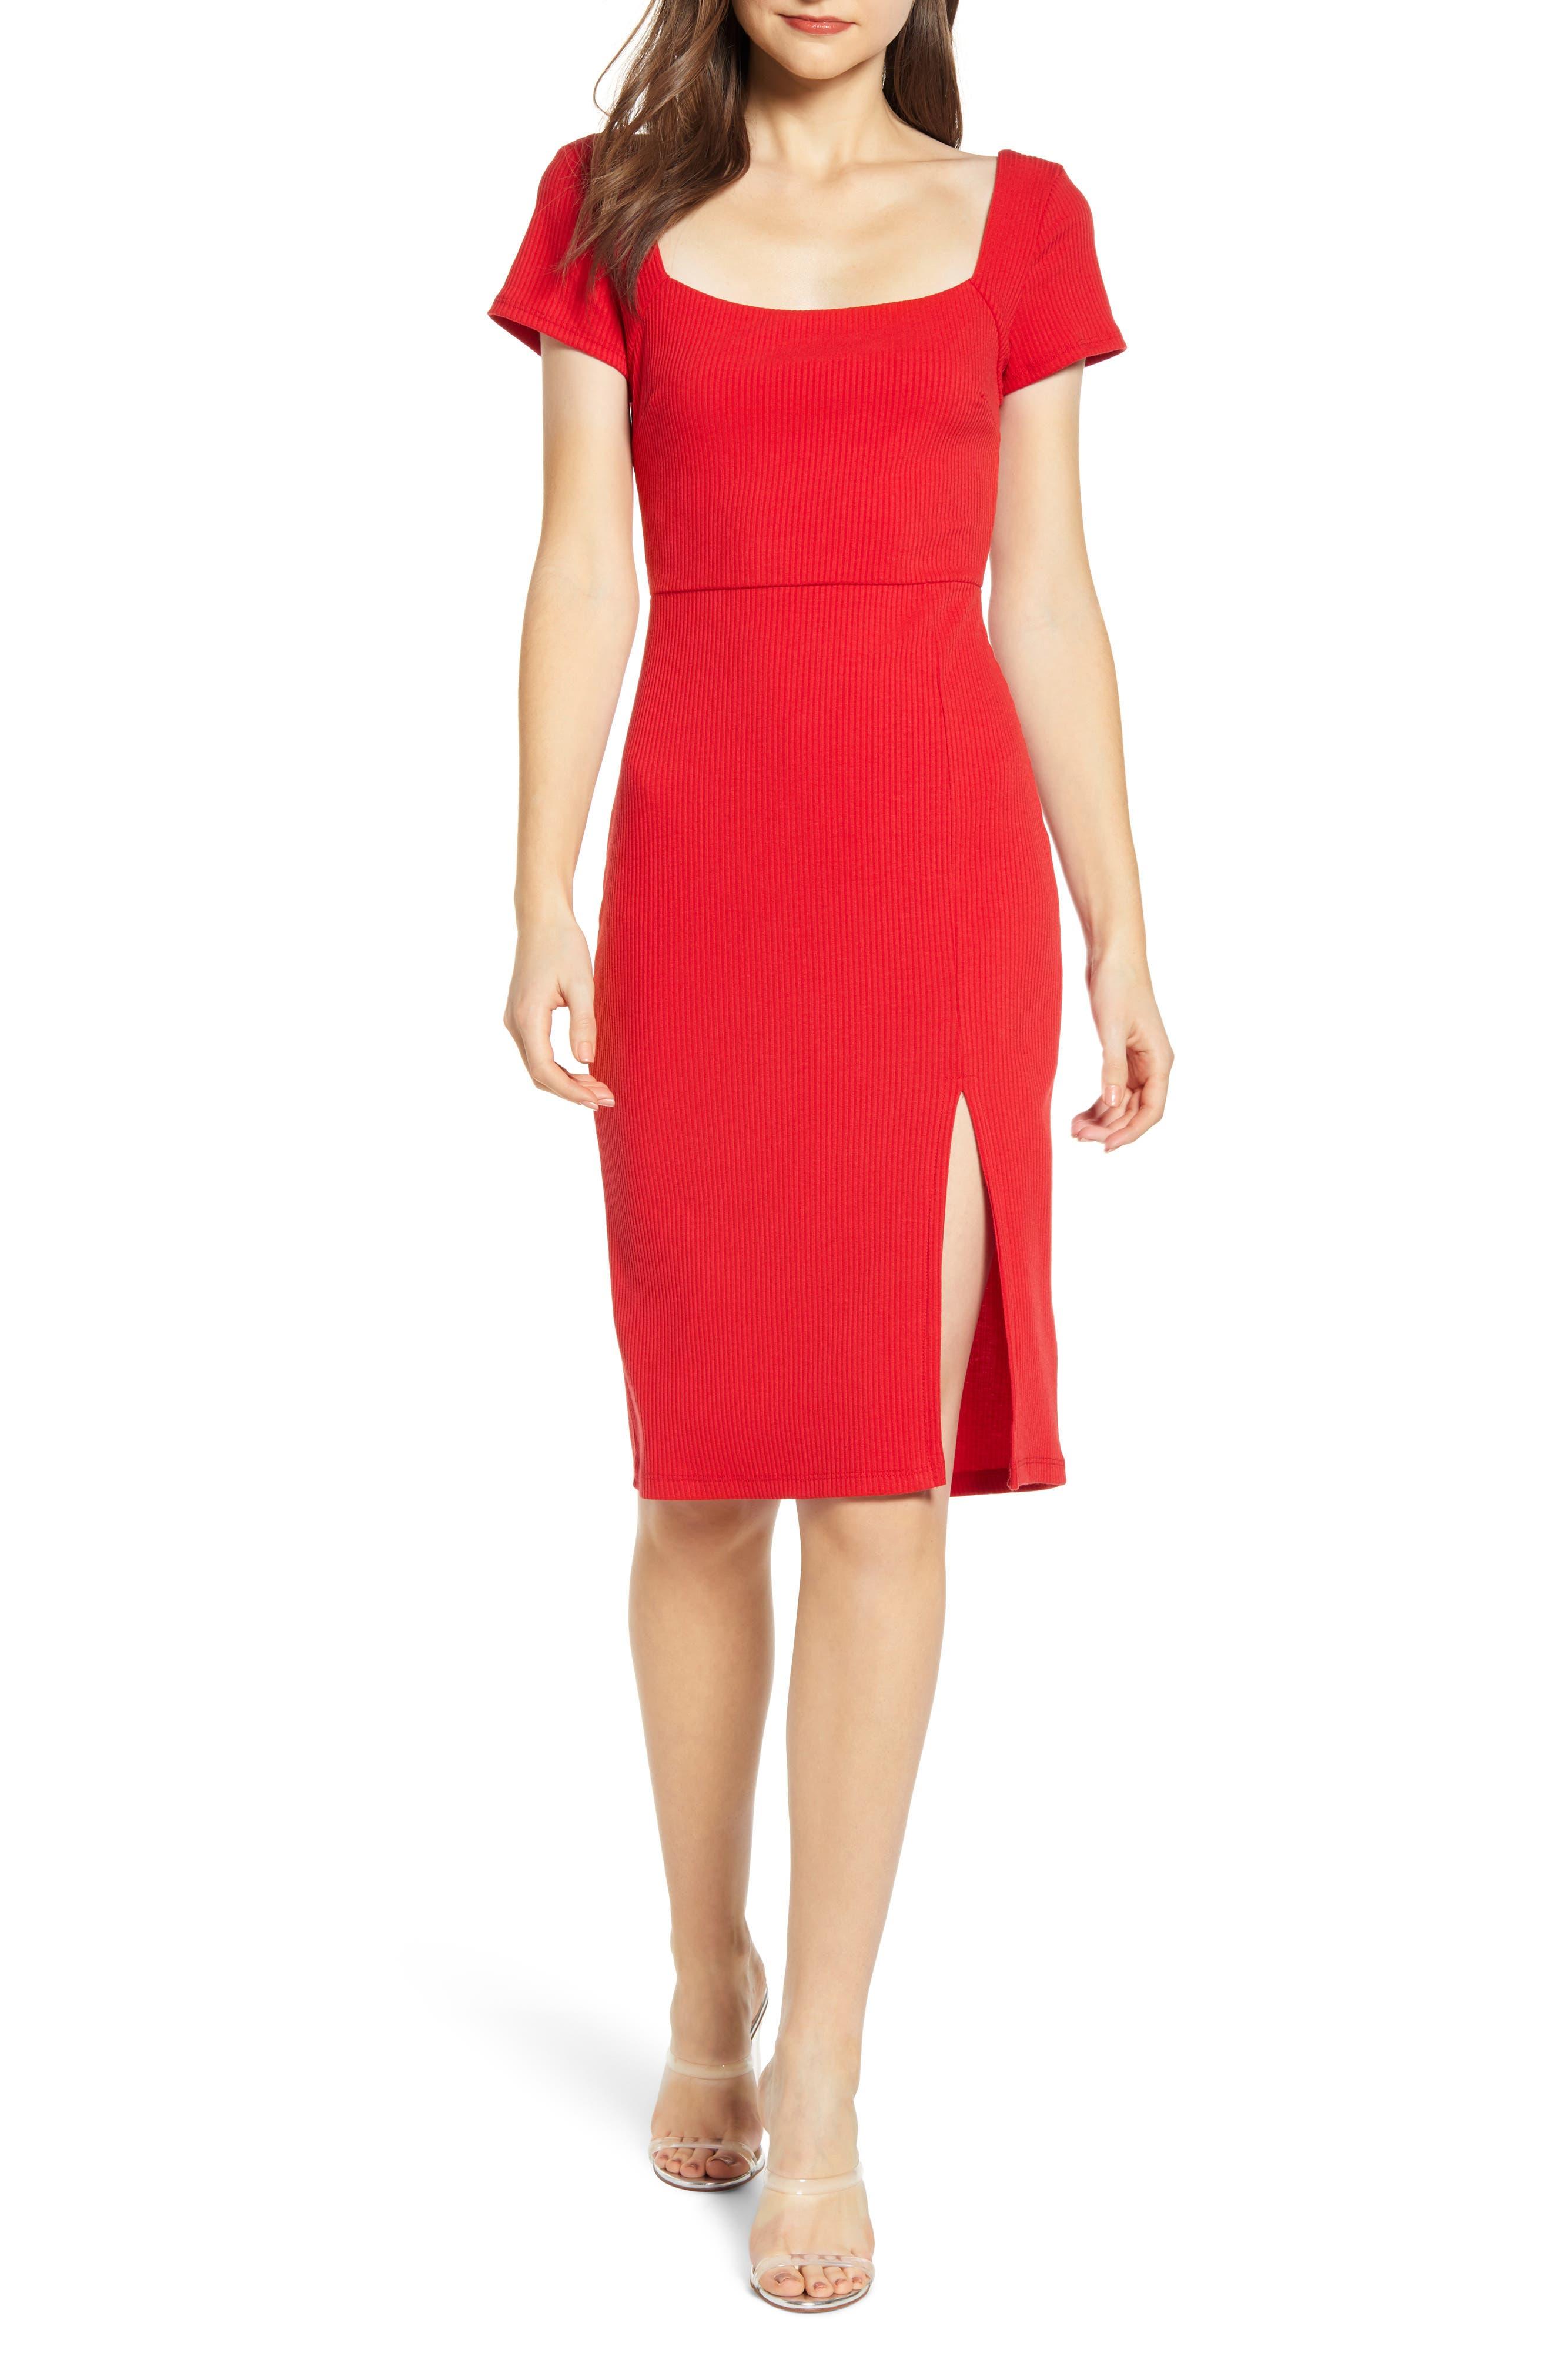 All In Favor Ribbed Square Neck Midi Dress, Red